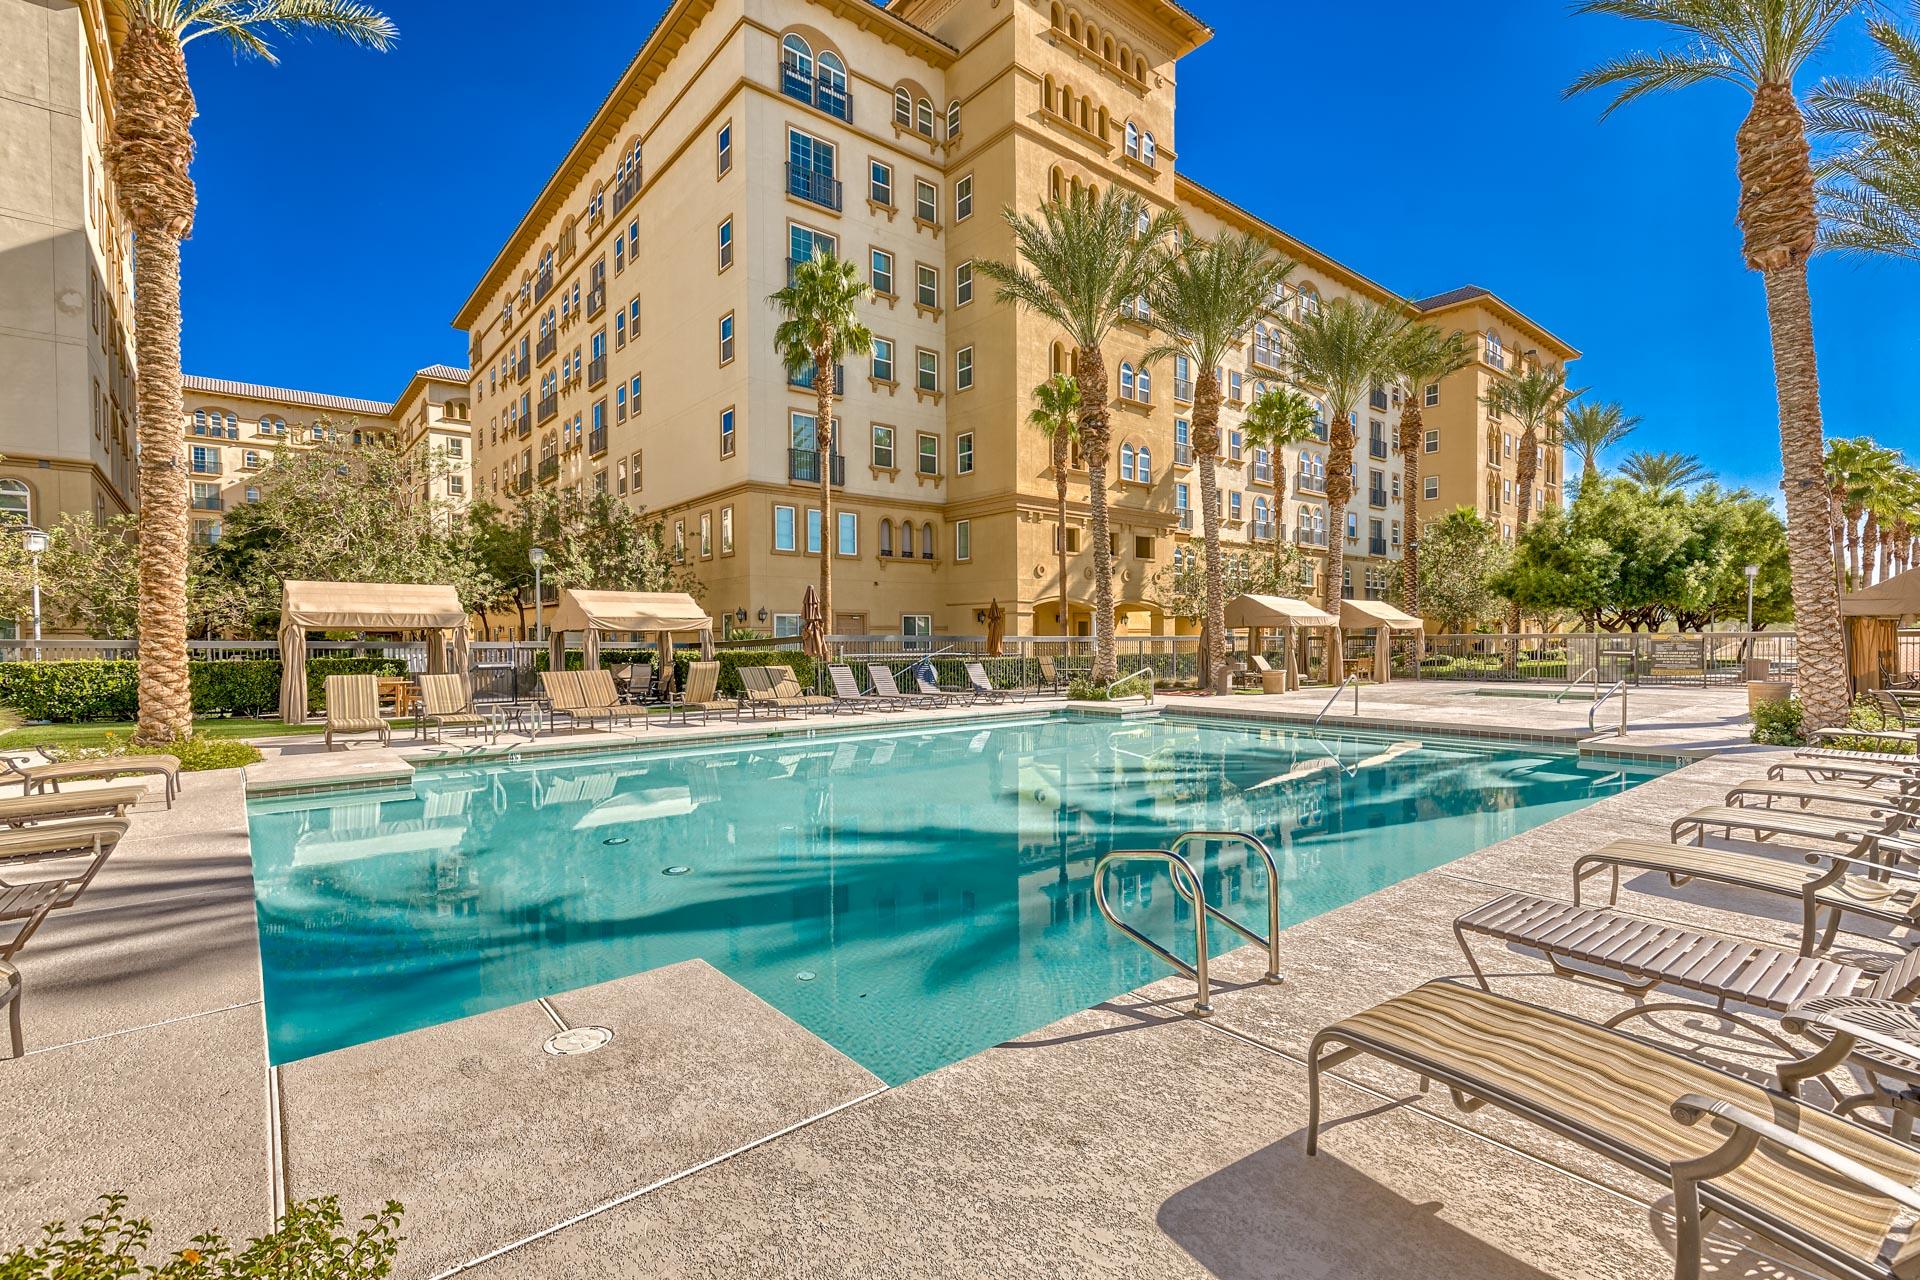 Boca Raton Las Vegas Condos For Sale South Strip Condos